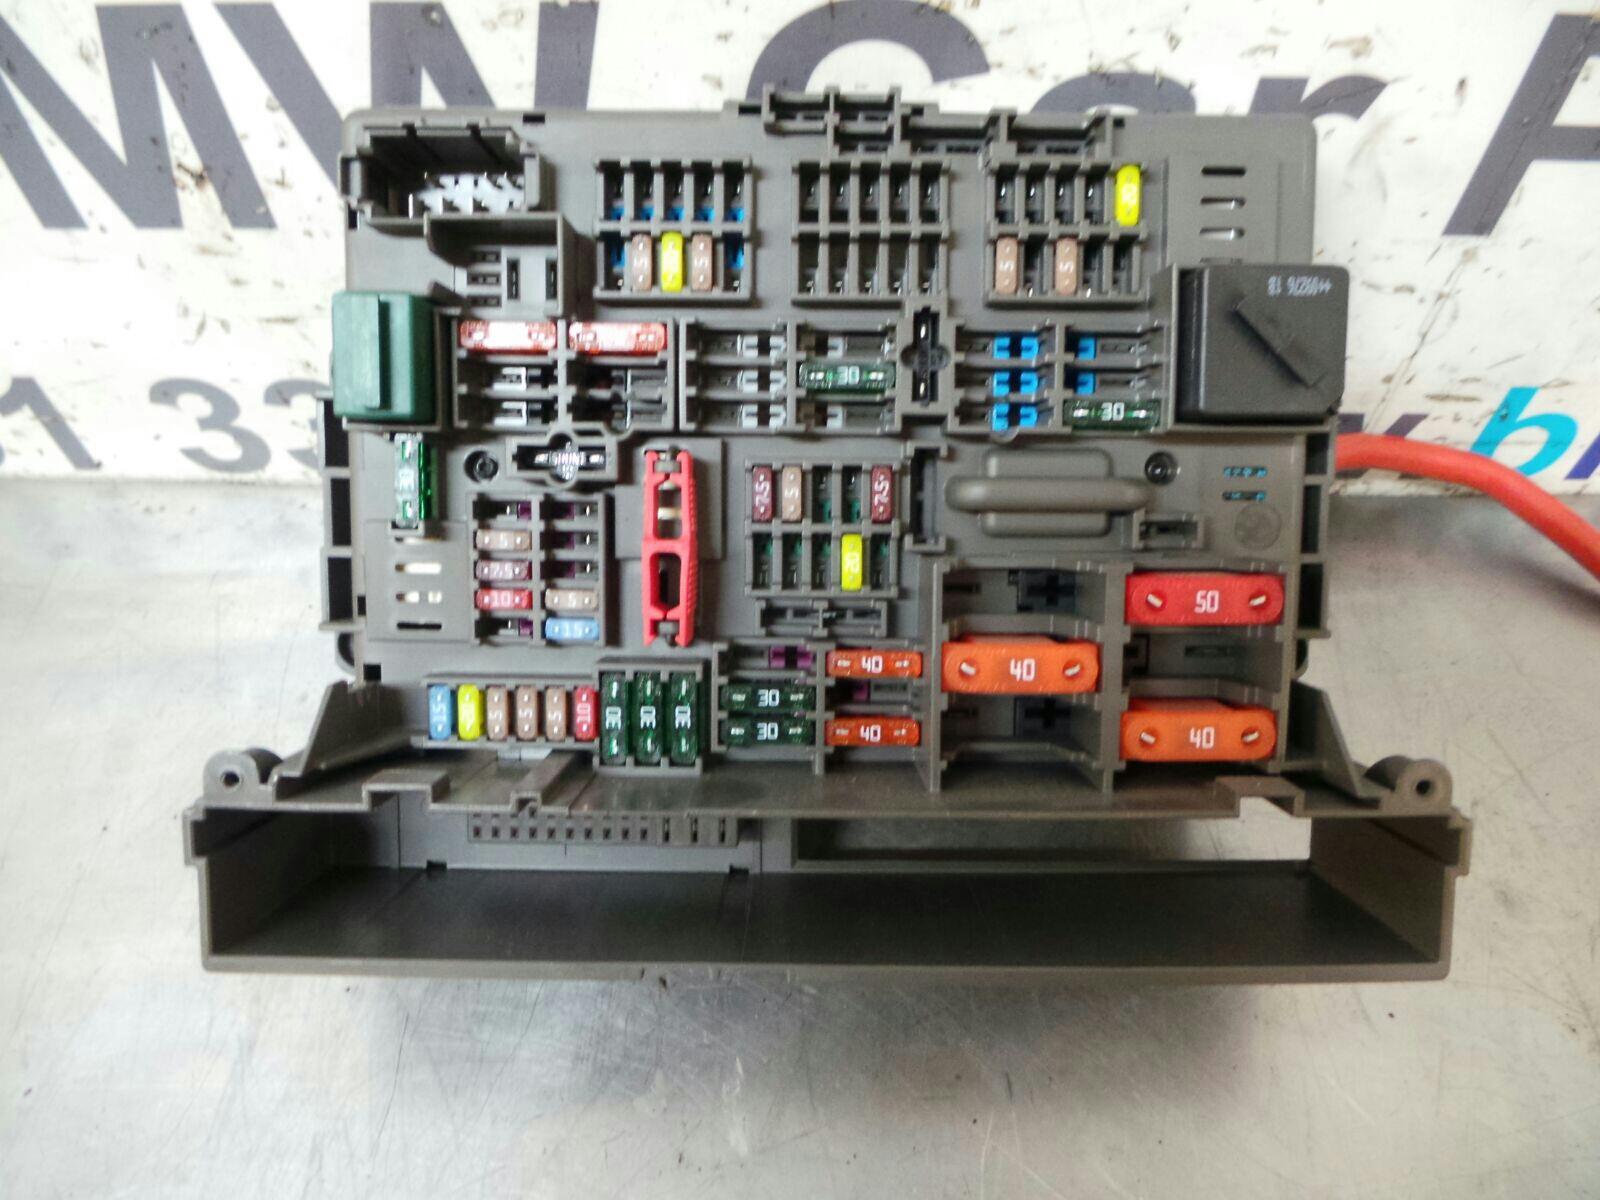 Wiring Diagram Bmw 1 Series | Bmw E88 Fuse Box |  | Wiring Diagram